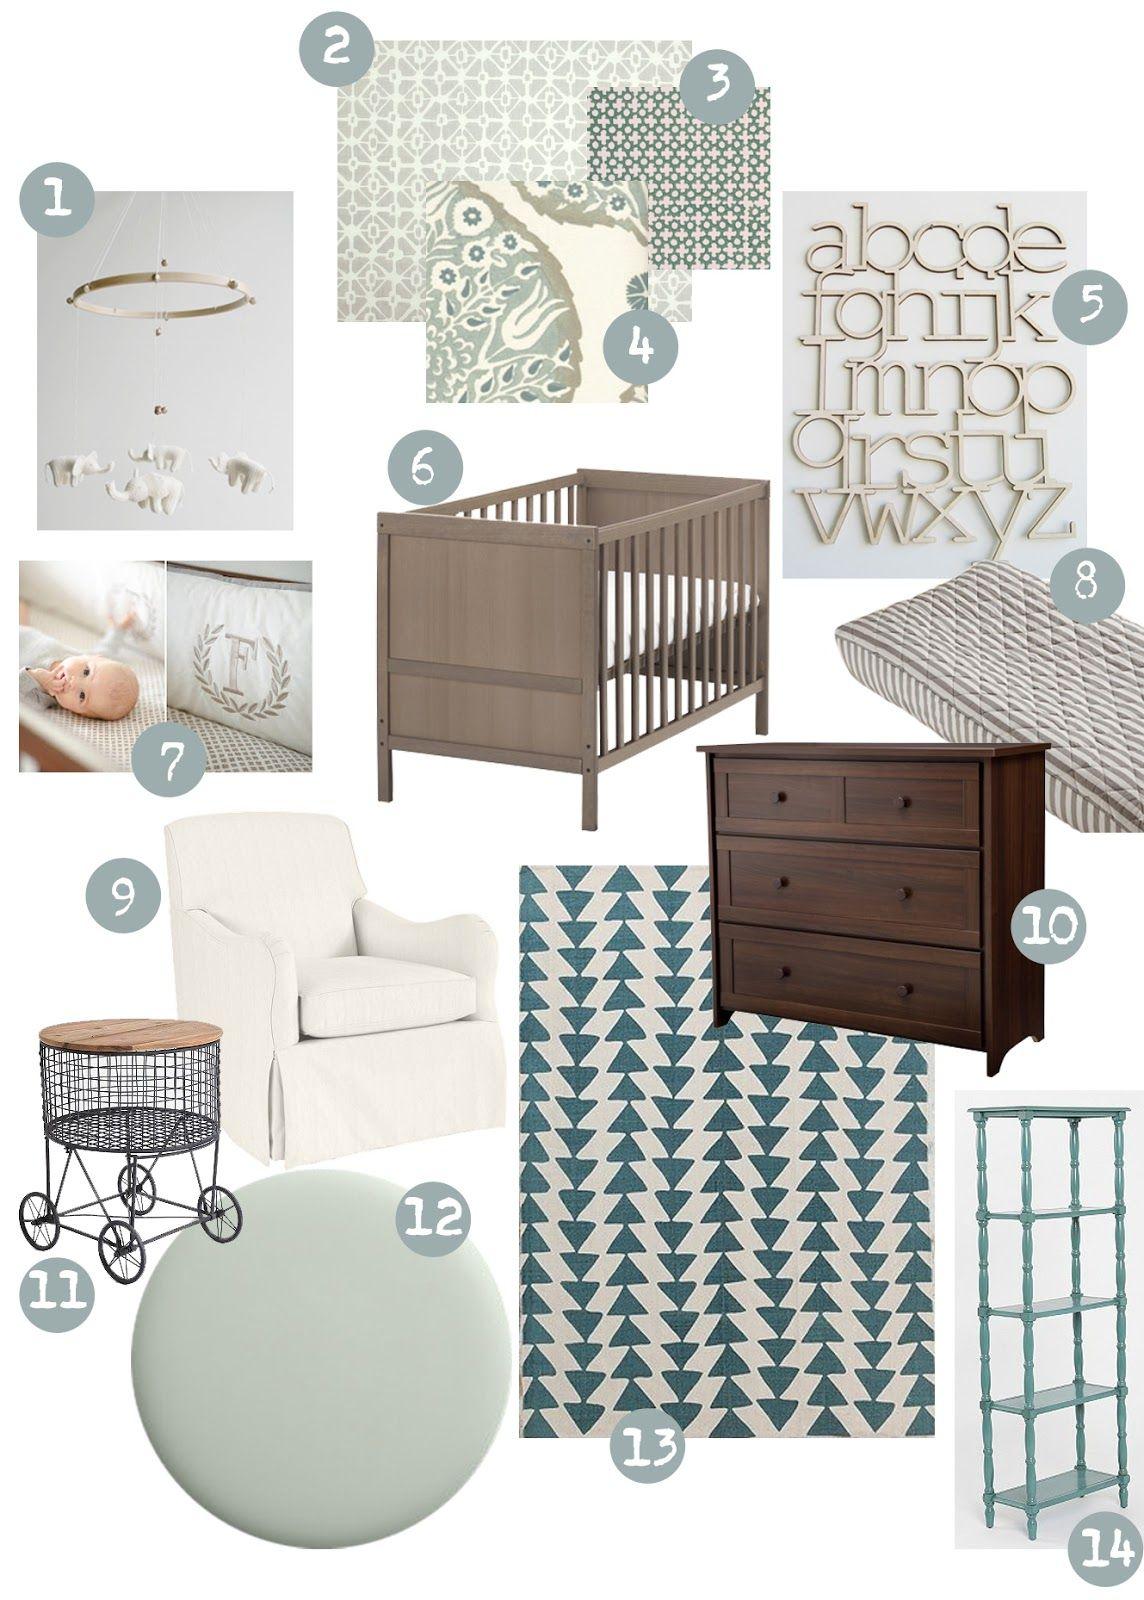 Sweet Abode Neutral Nursery Ideas Love This With A Dark